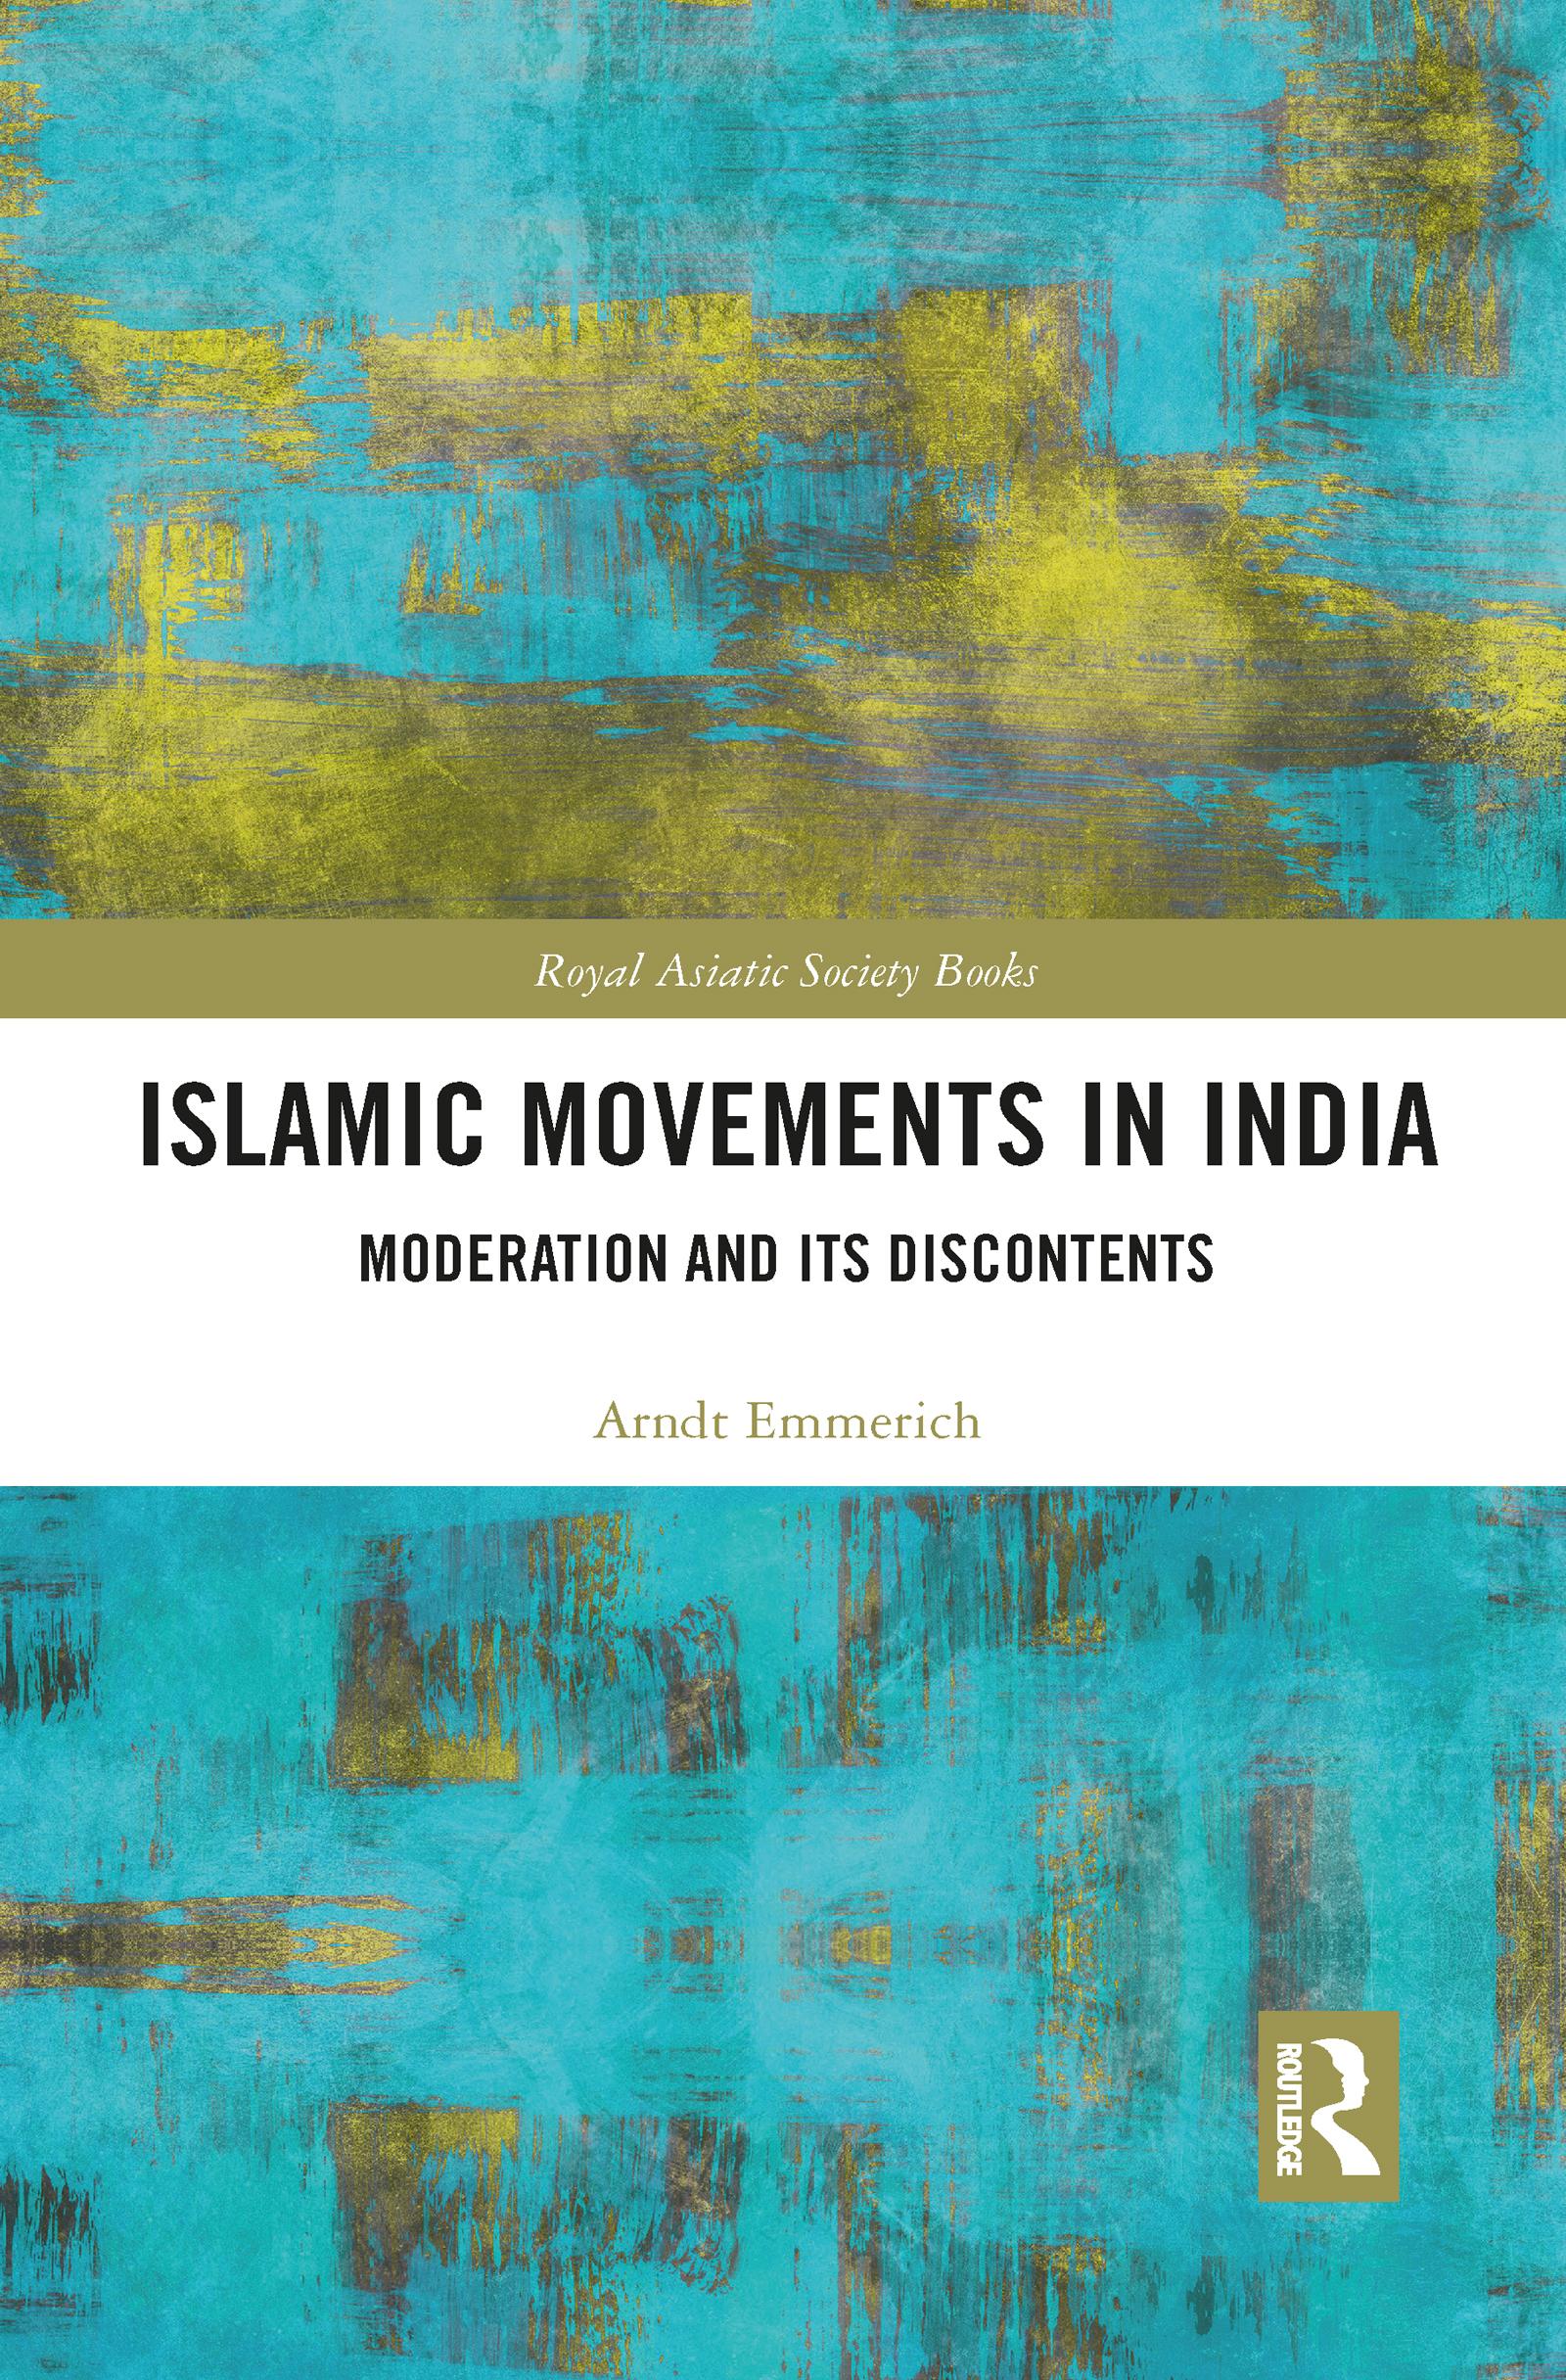 Islamic Movements in India